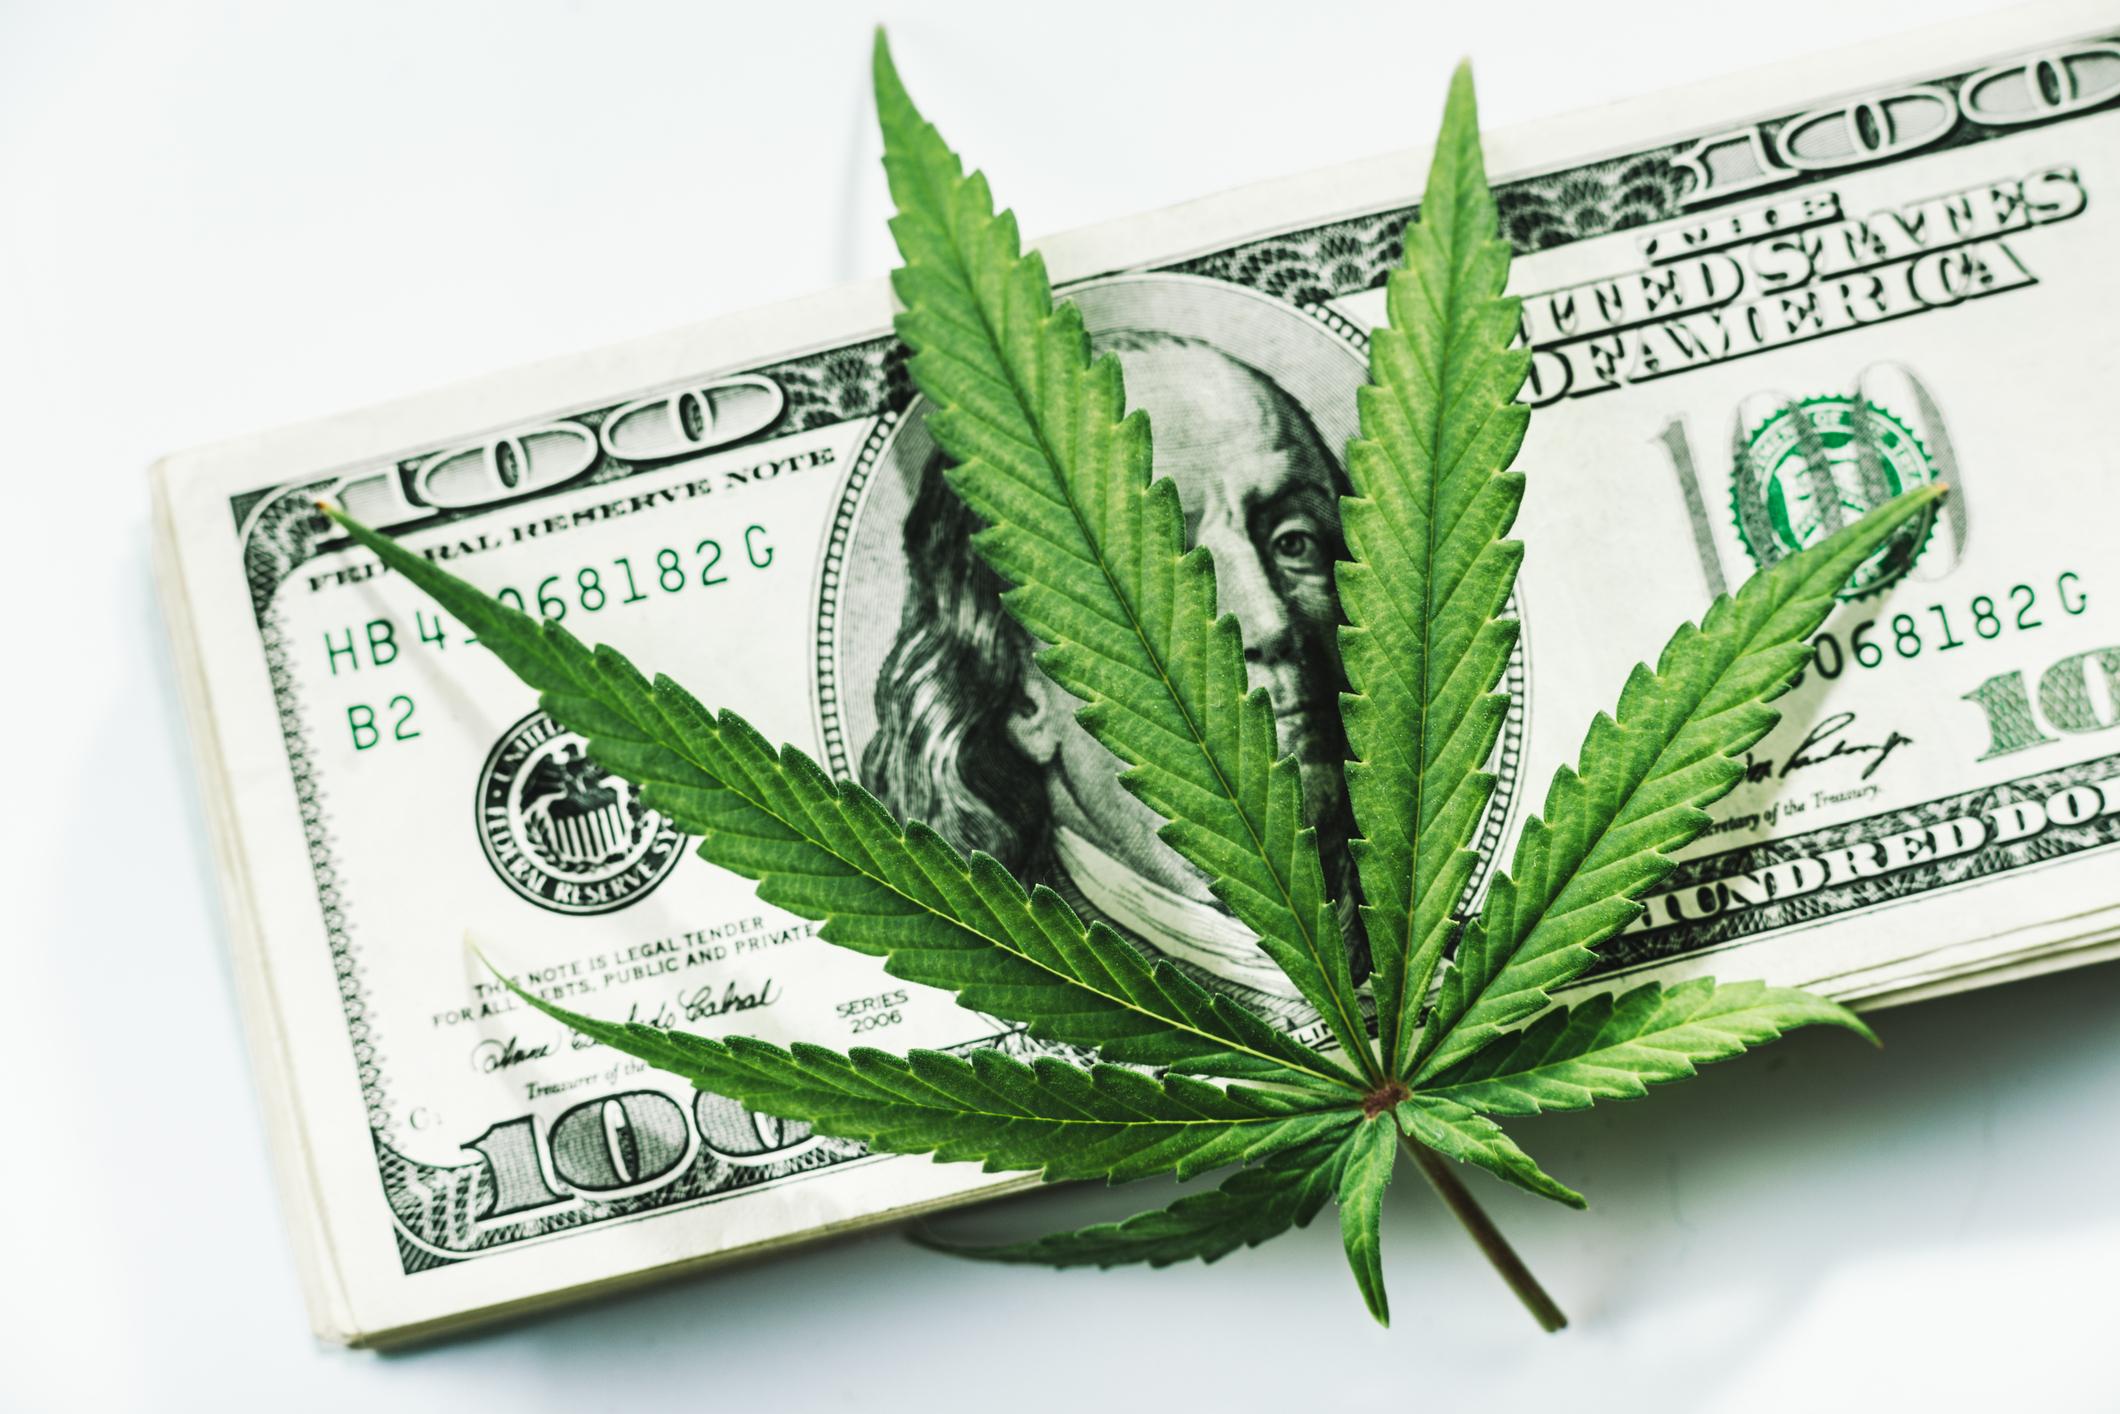 Marijuana leaf on top of stack of $100 bills